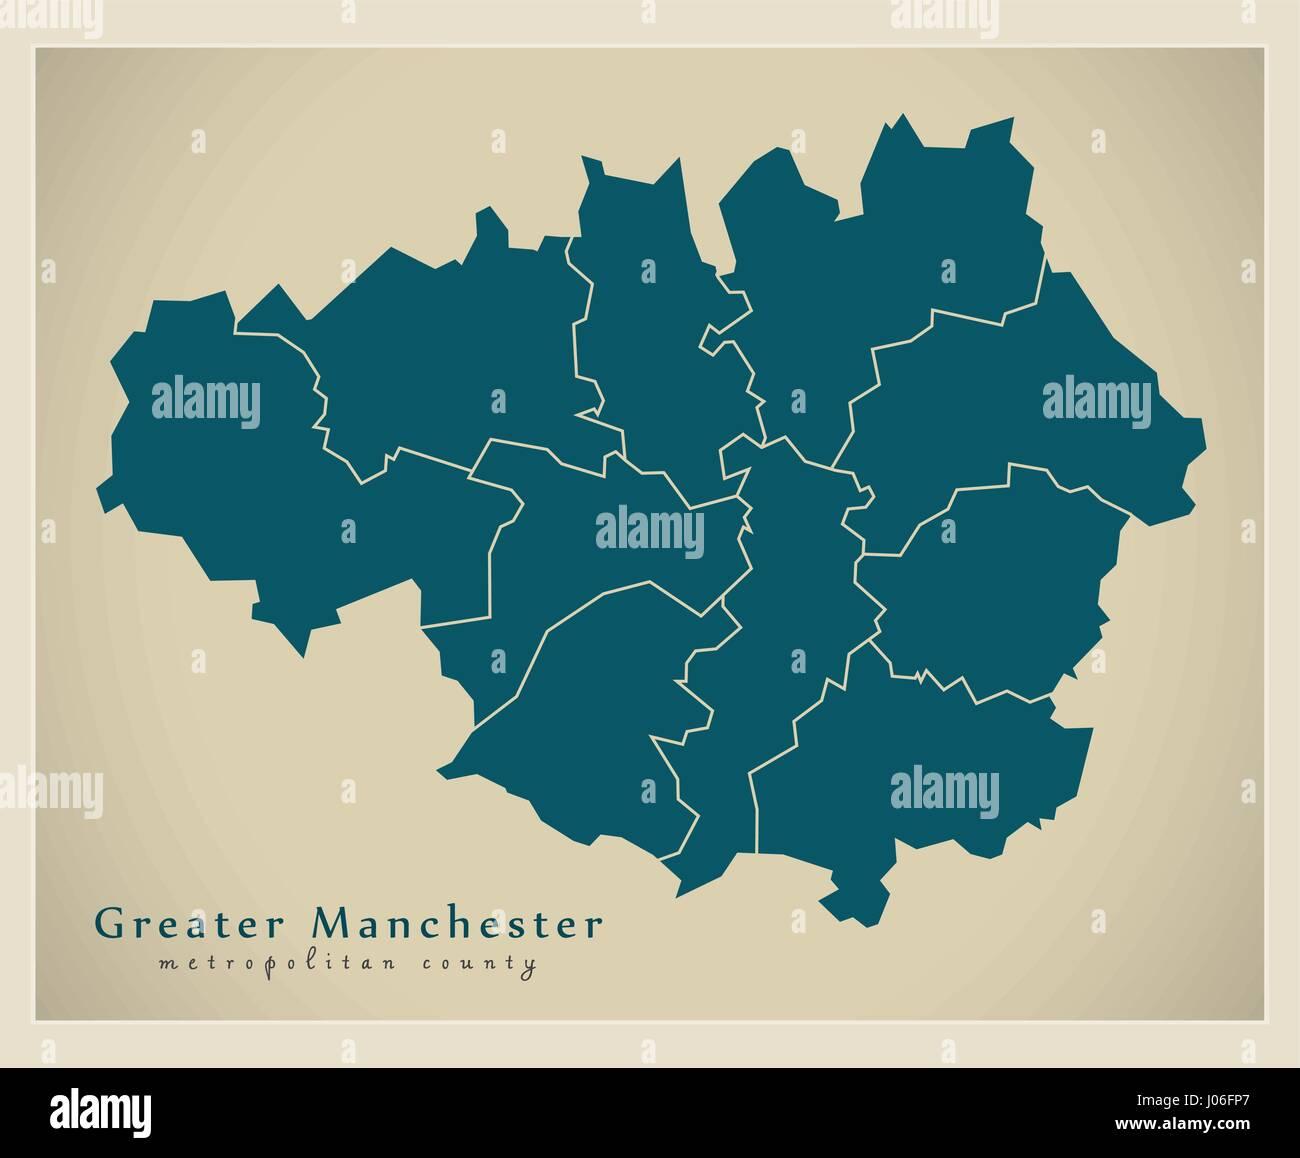 modern map greater manchester metropolitan county uk